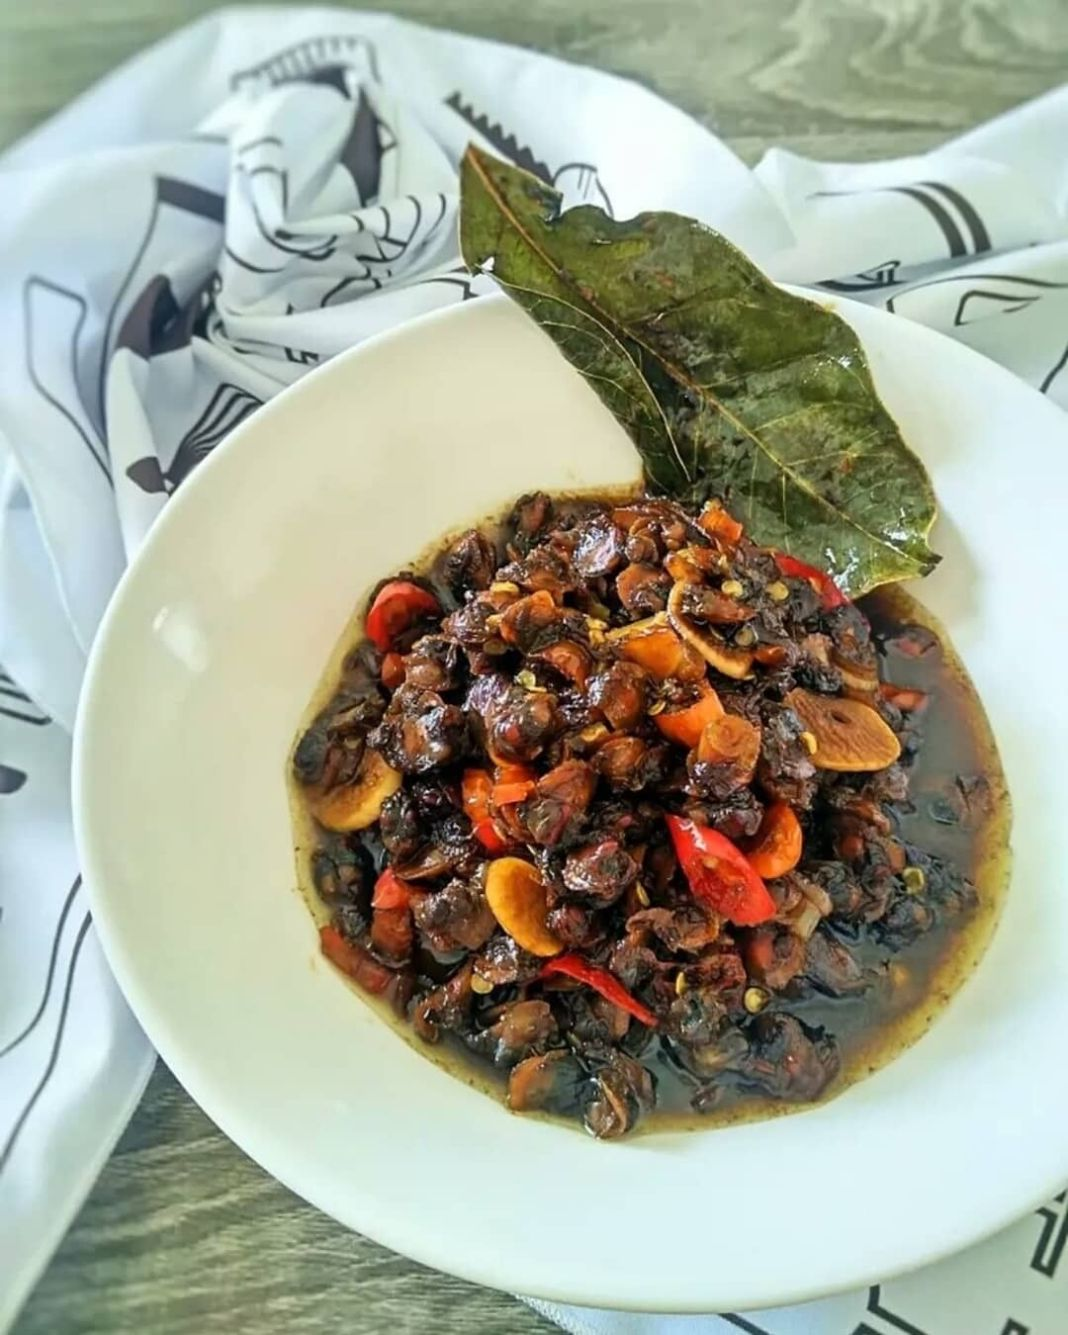 Info kuliner, OSENG KECAP KERANG DARA (3-4 porsi)  BAHAN : 1/4 kg kerang dara (cuci bersih) 1 sdm saos tiram …